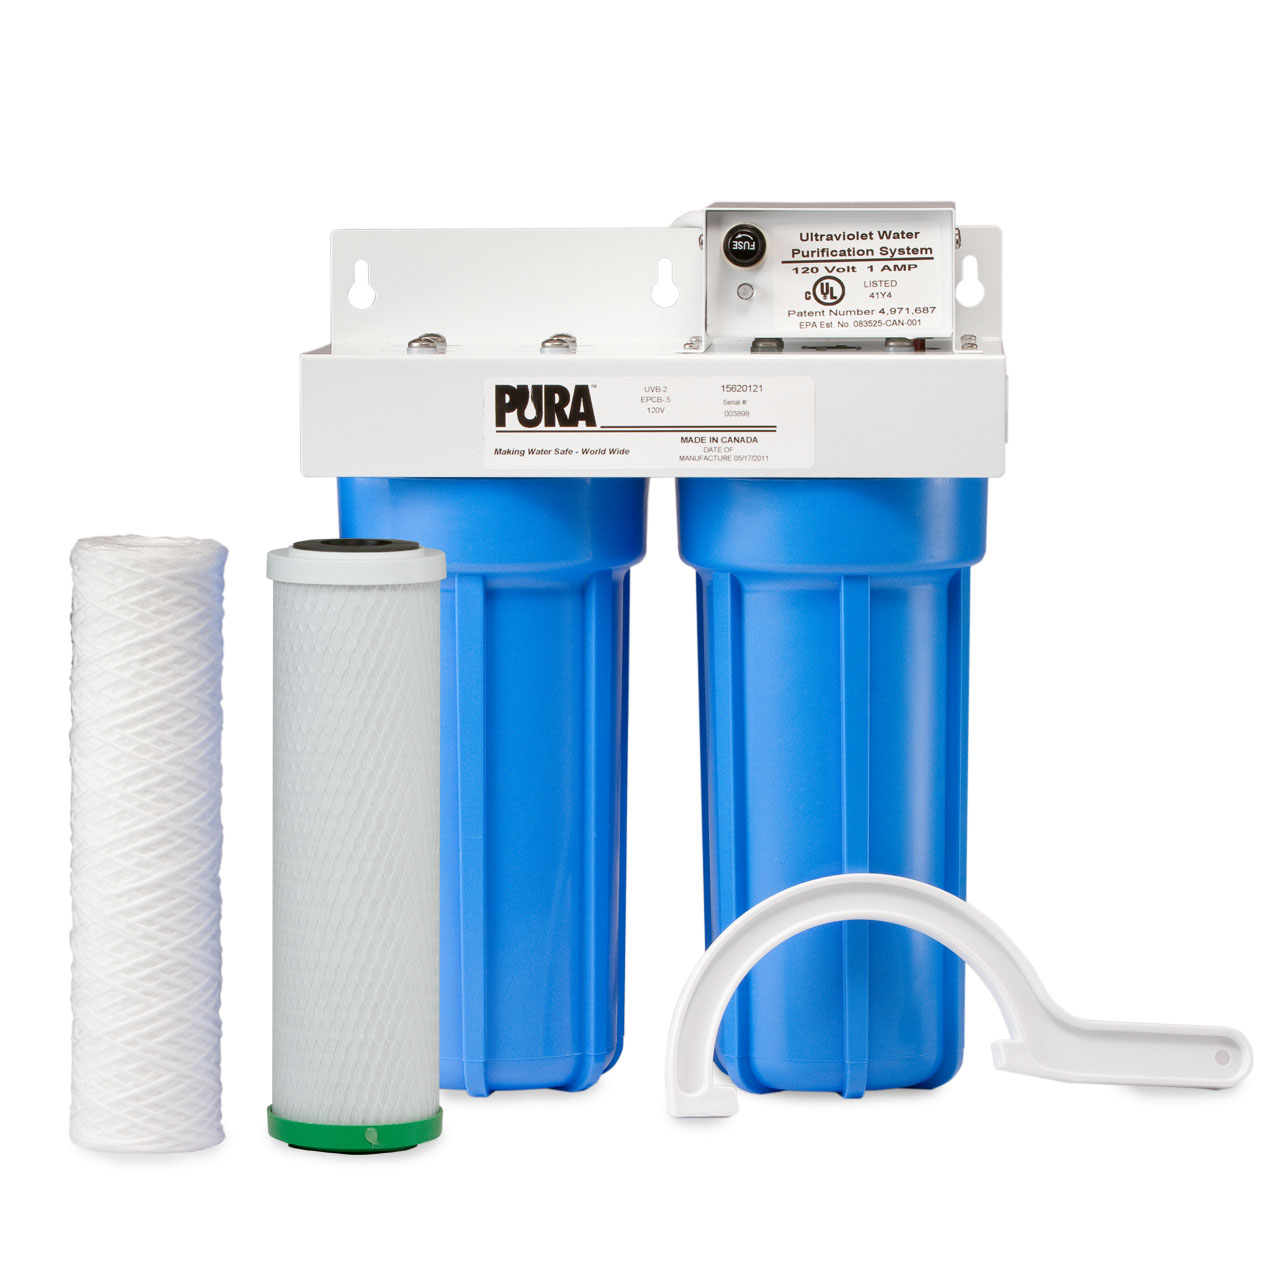 pura ultraviolet water purification system pura uv filter. Black Bedroom Furniture Sets. Home Design Ideas